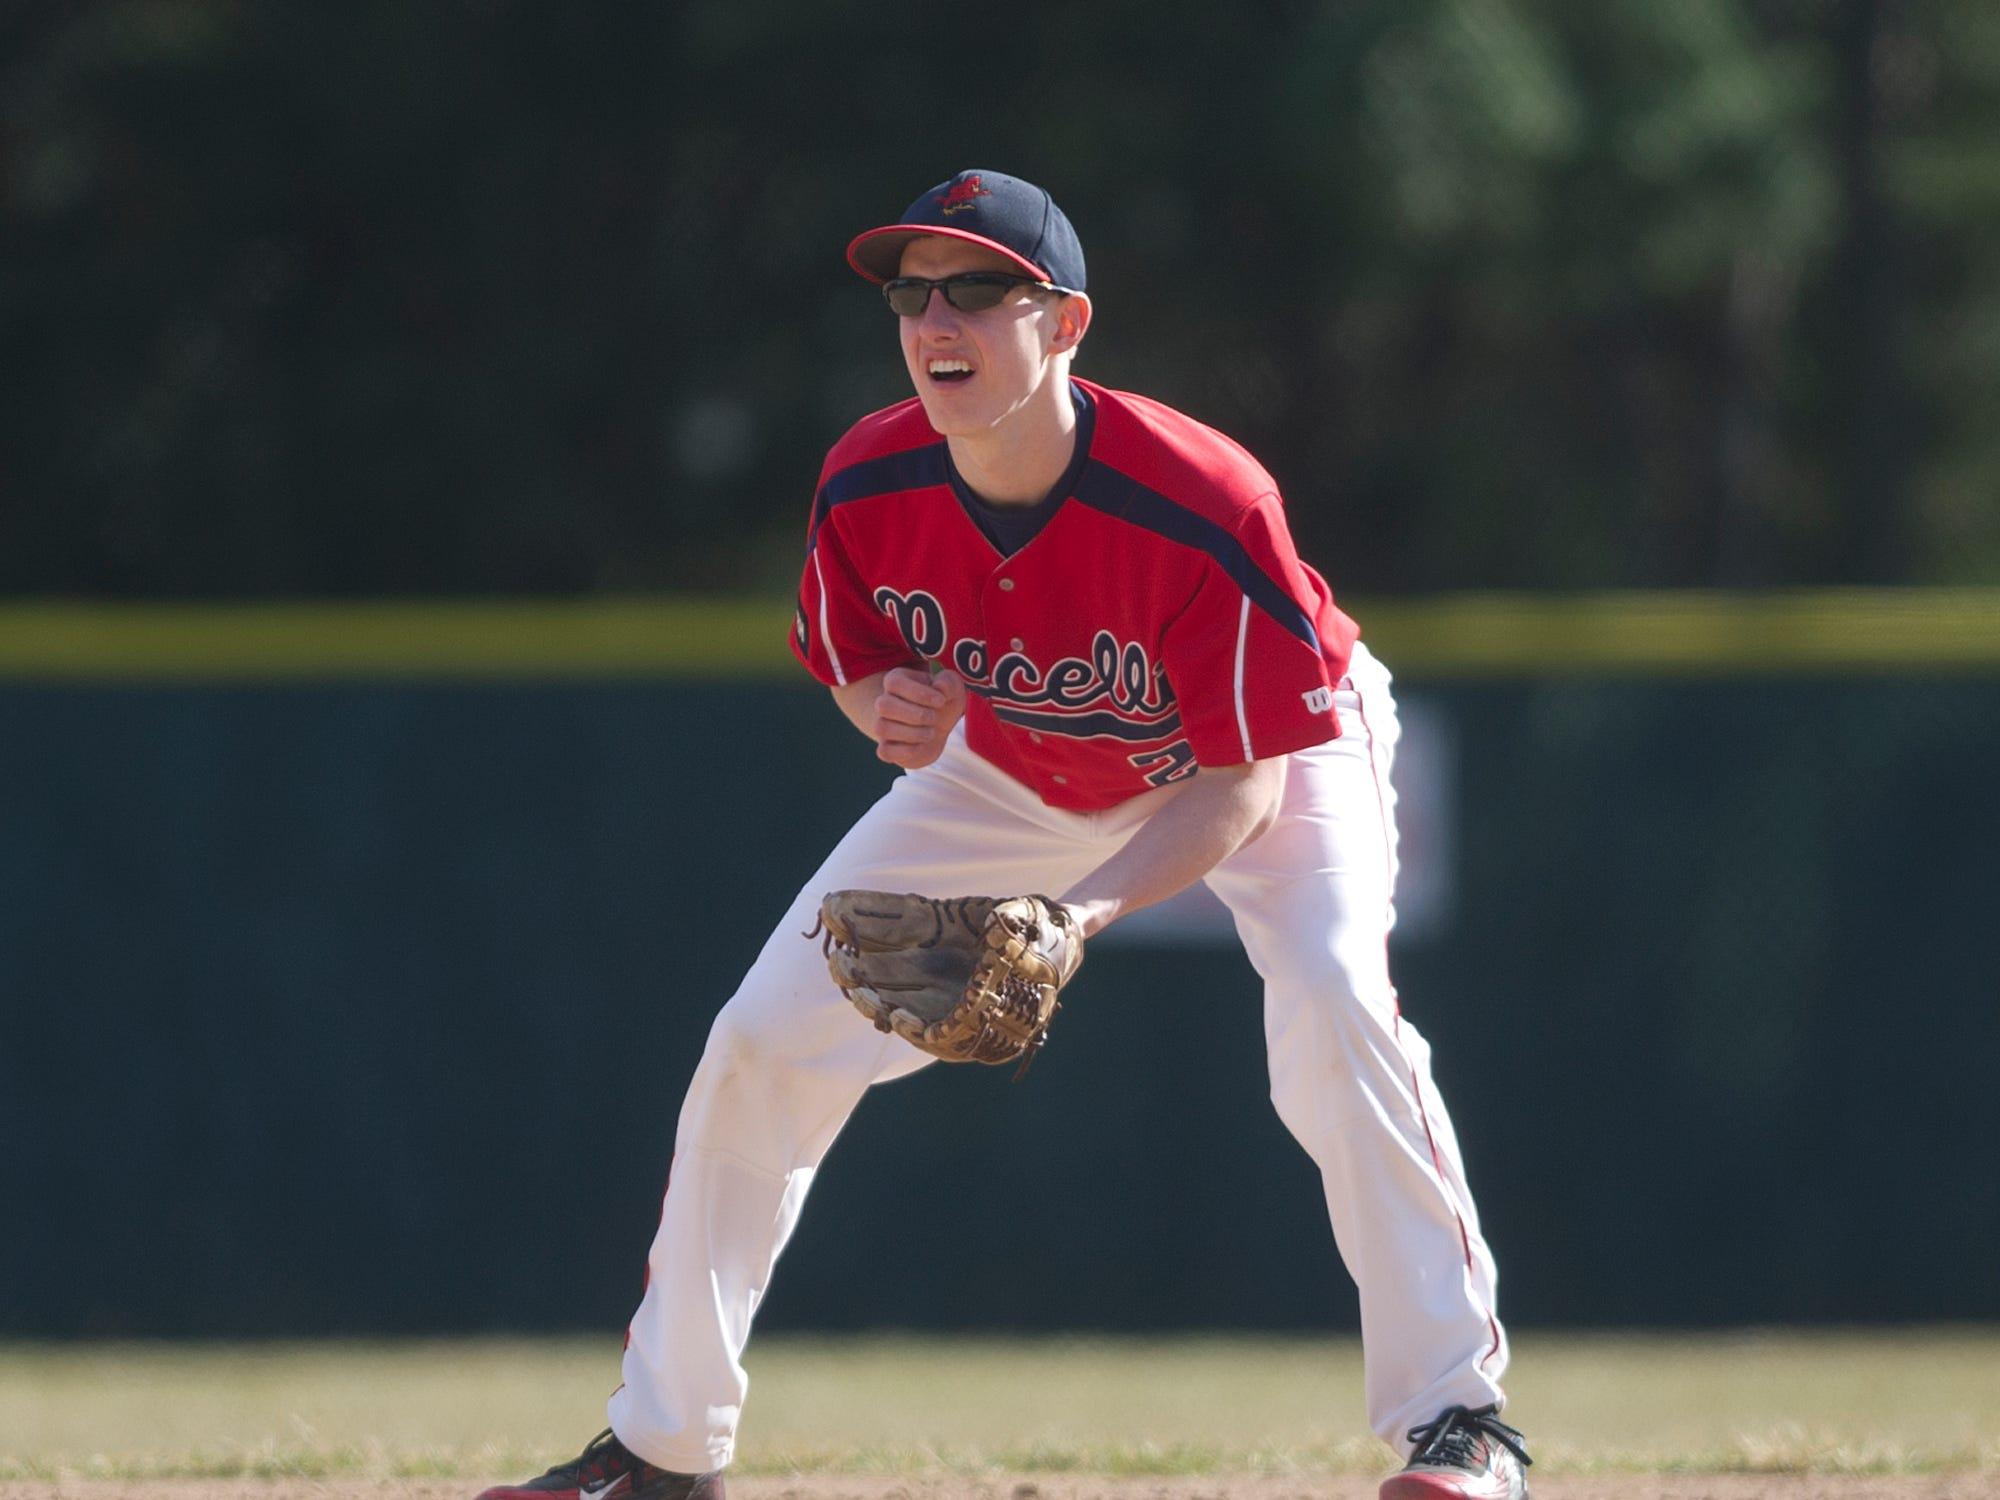 Pacelli's Troy Flugaur during the baseball game against Bonduel at Bukolt Park in Stevens Point, Monday, April 13, 2015.